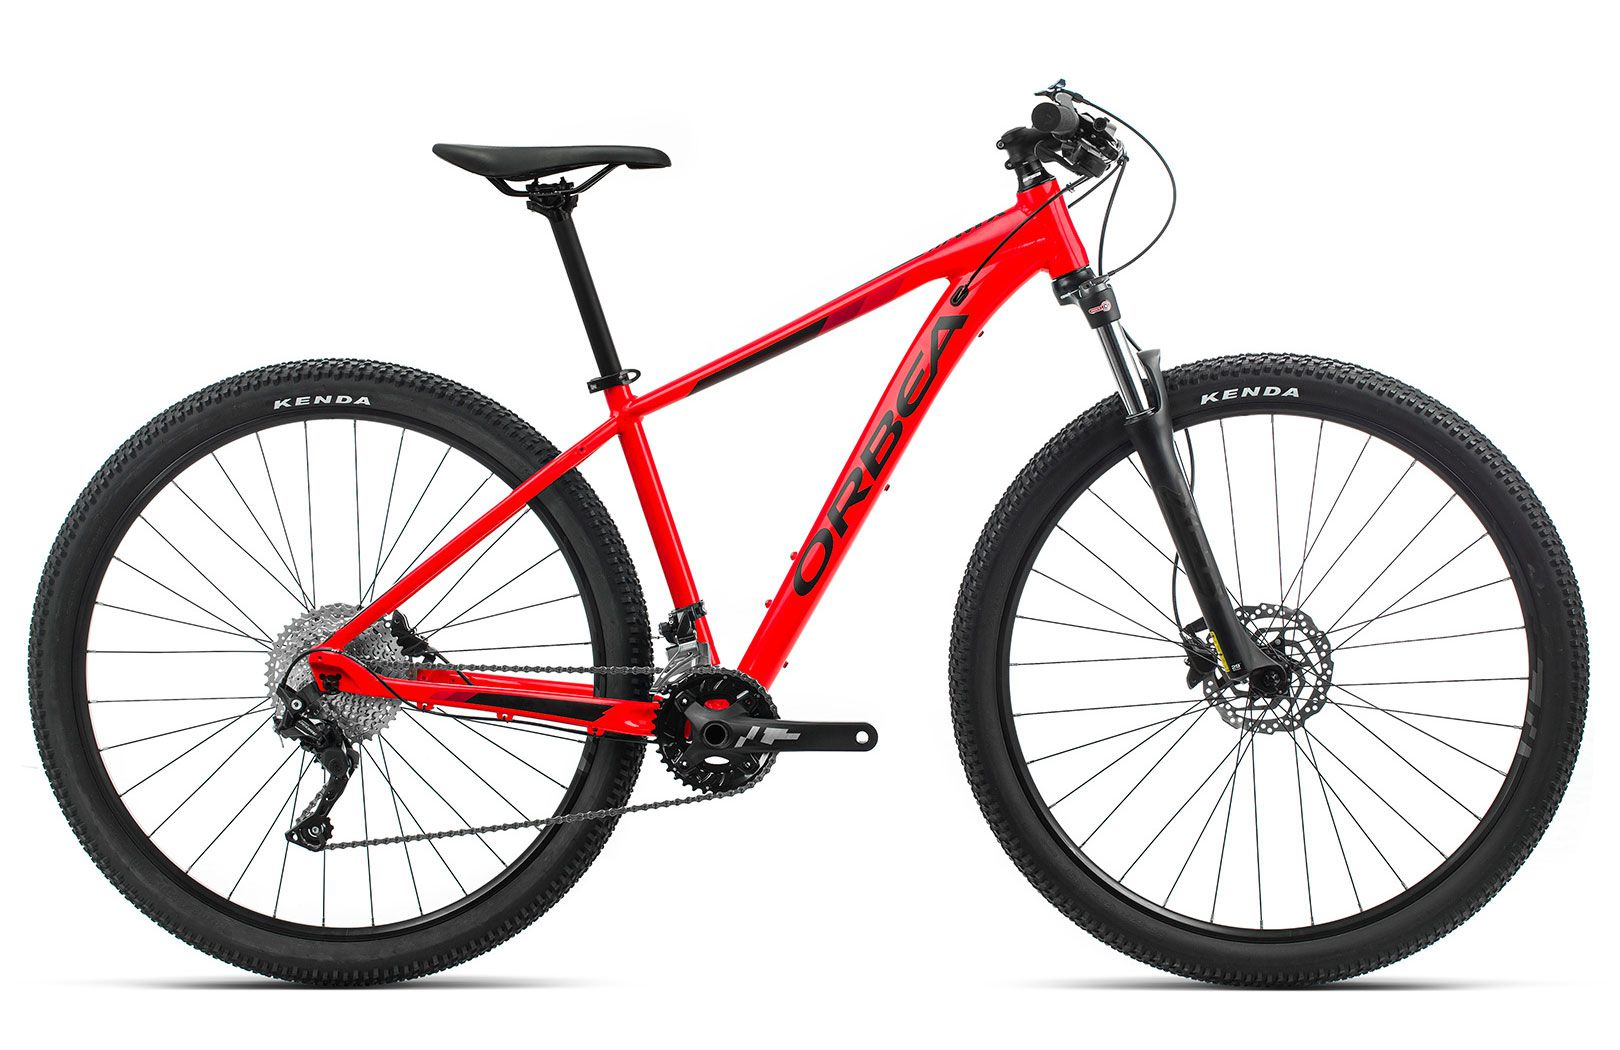 Bicicleta MTB Orbea MX 29 30 - Tam L - Vermelho/Preto 2020